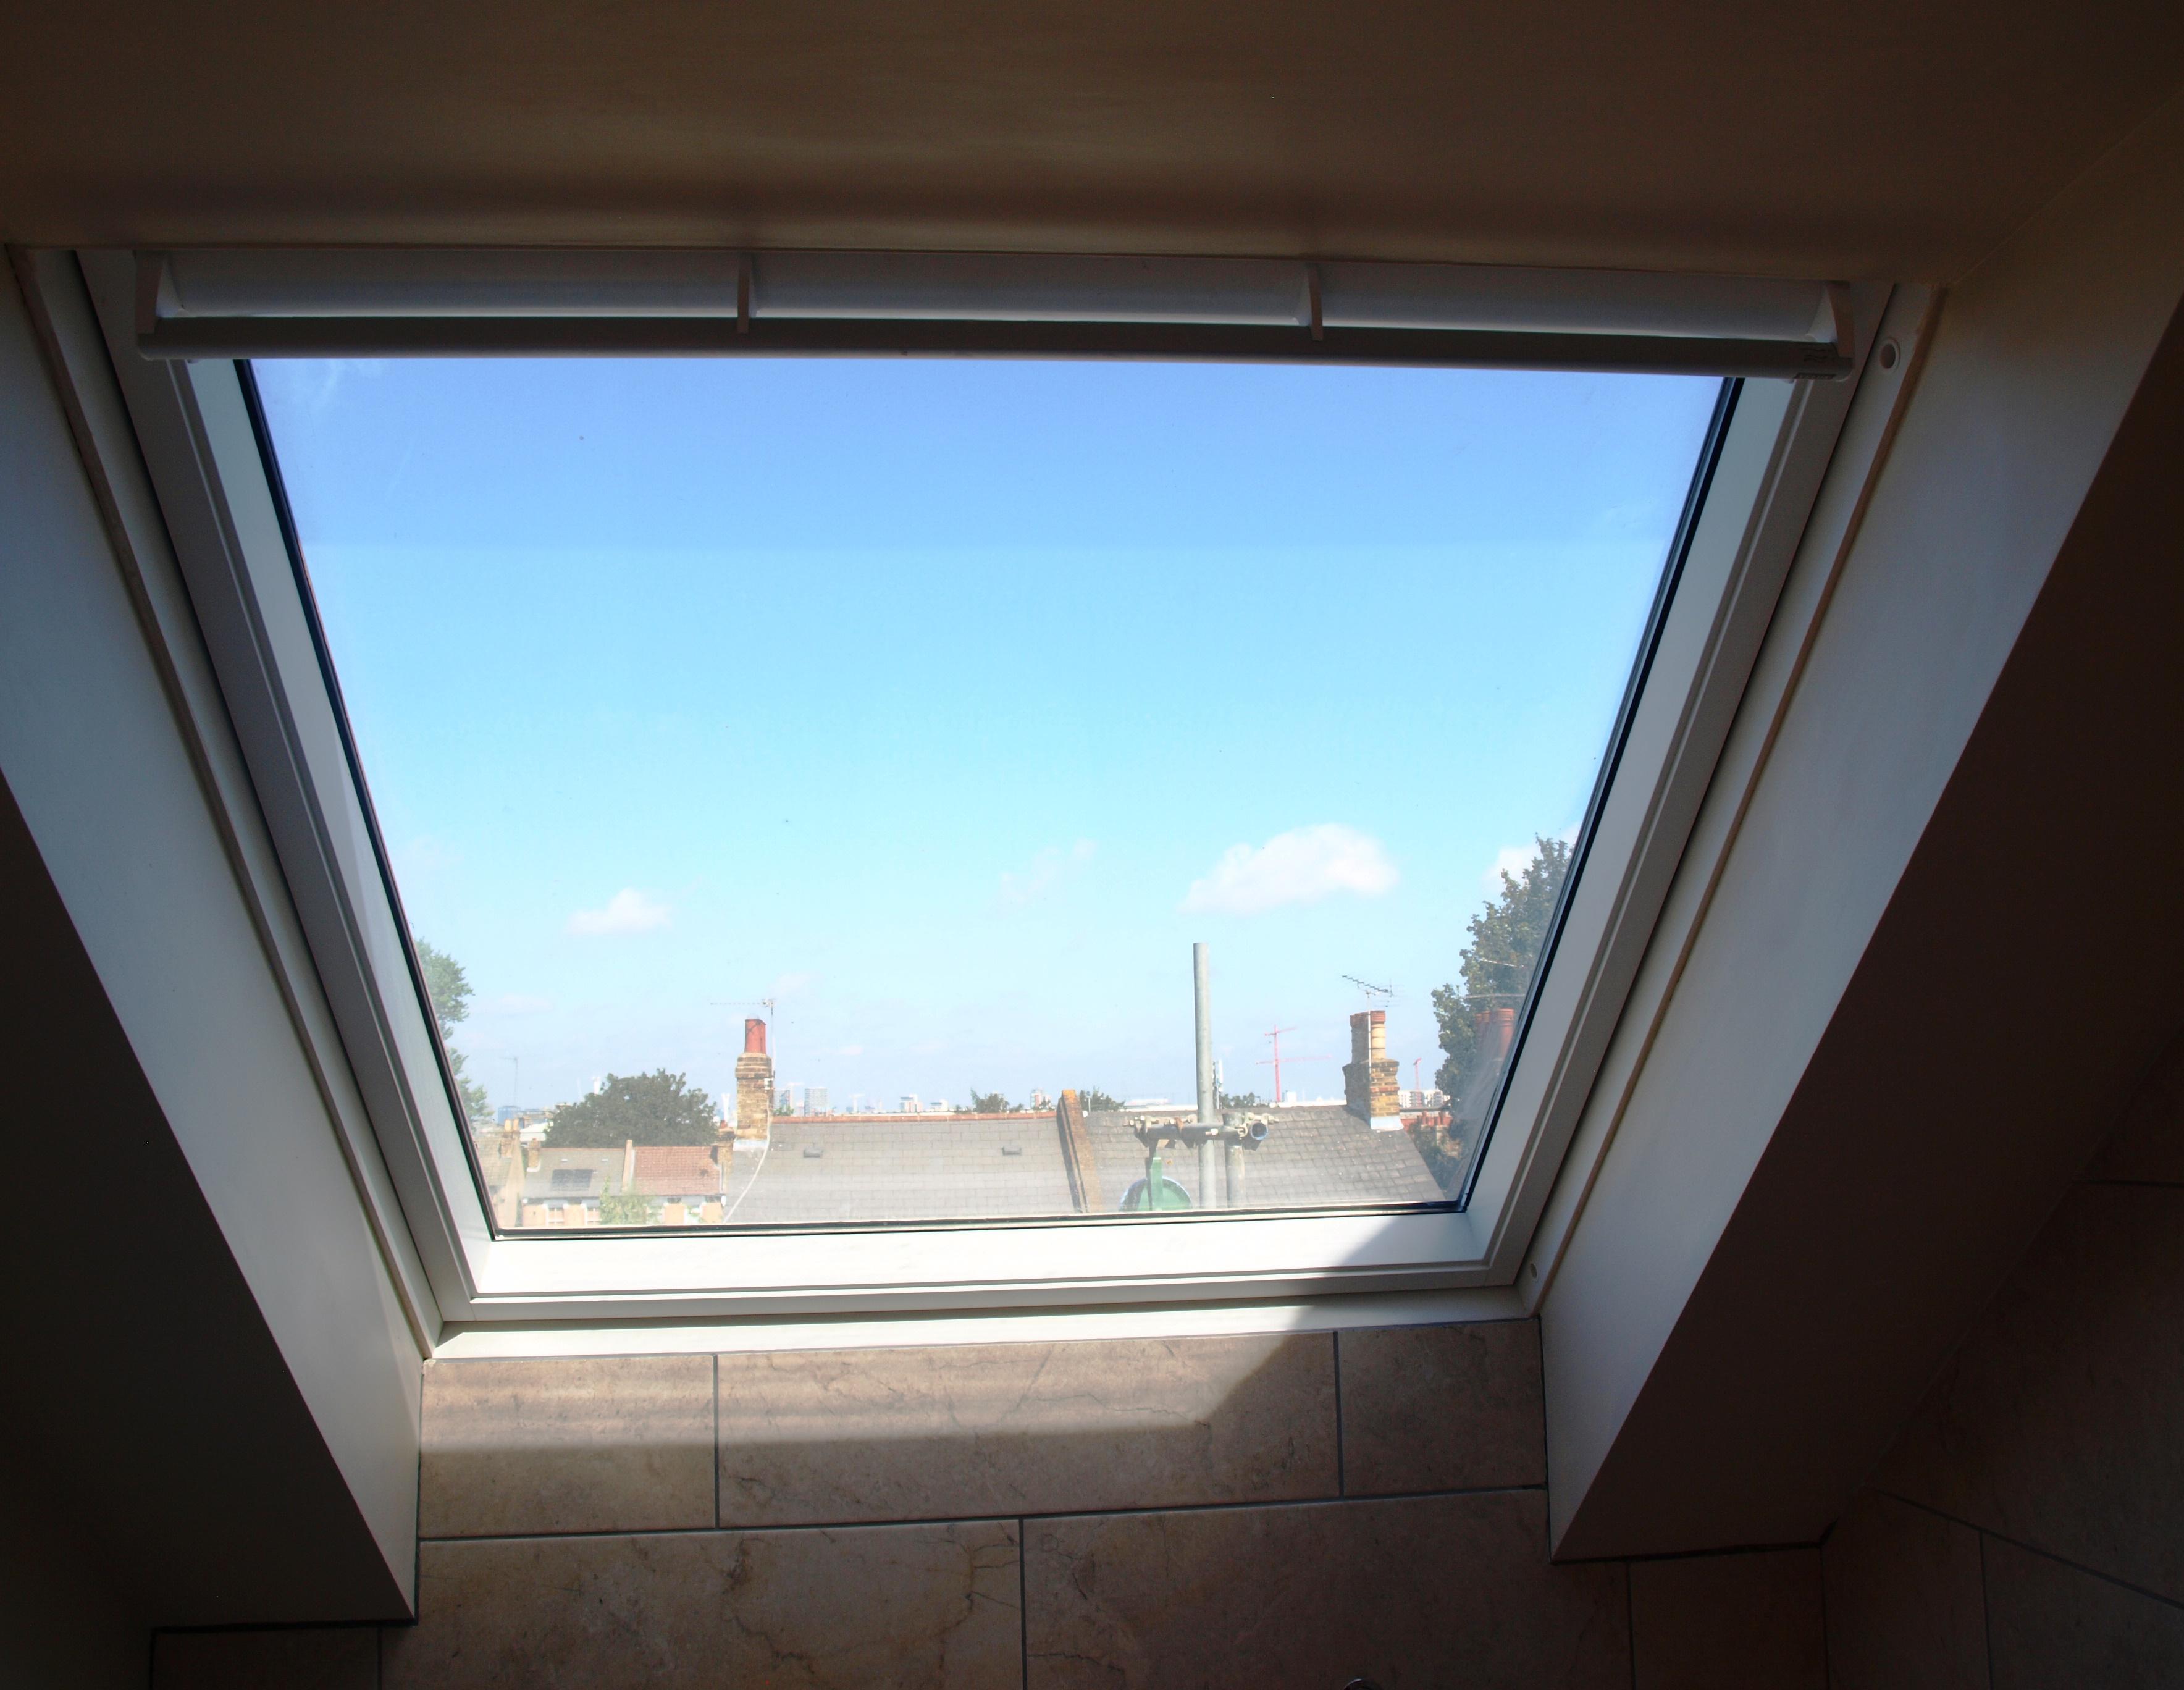 Loft Conversion with Shower Room Omnitub | SLK Services